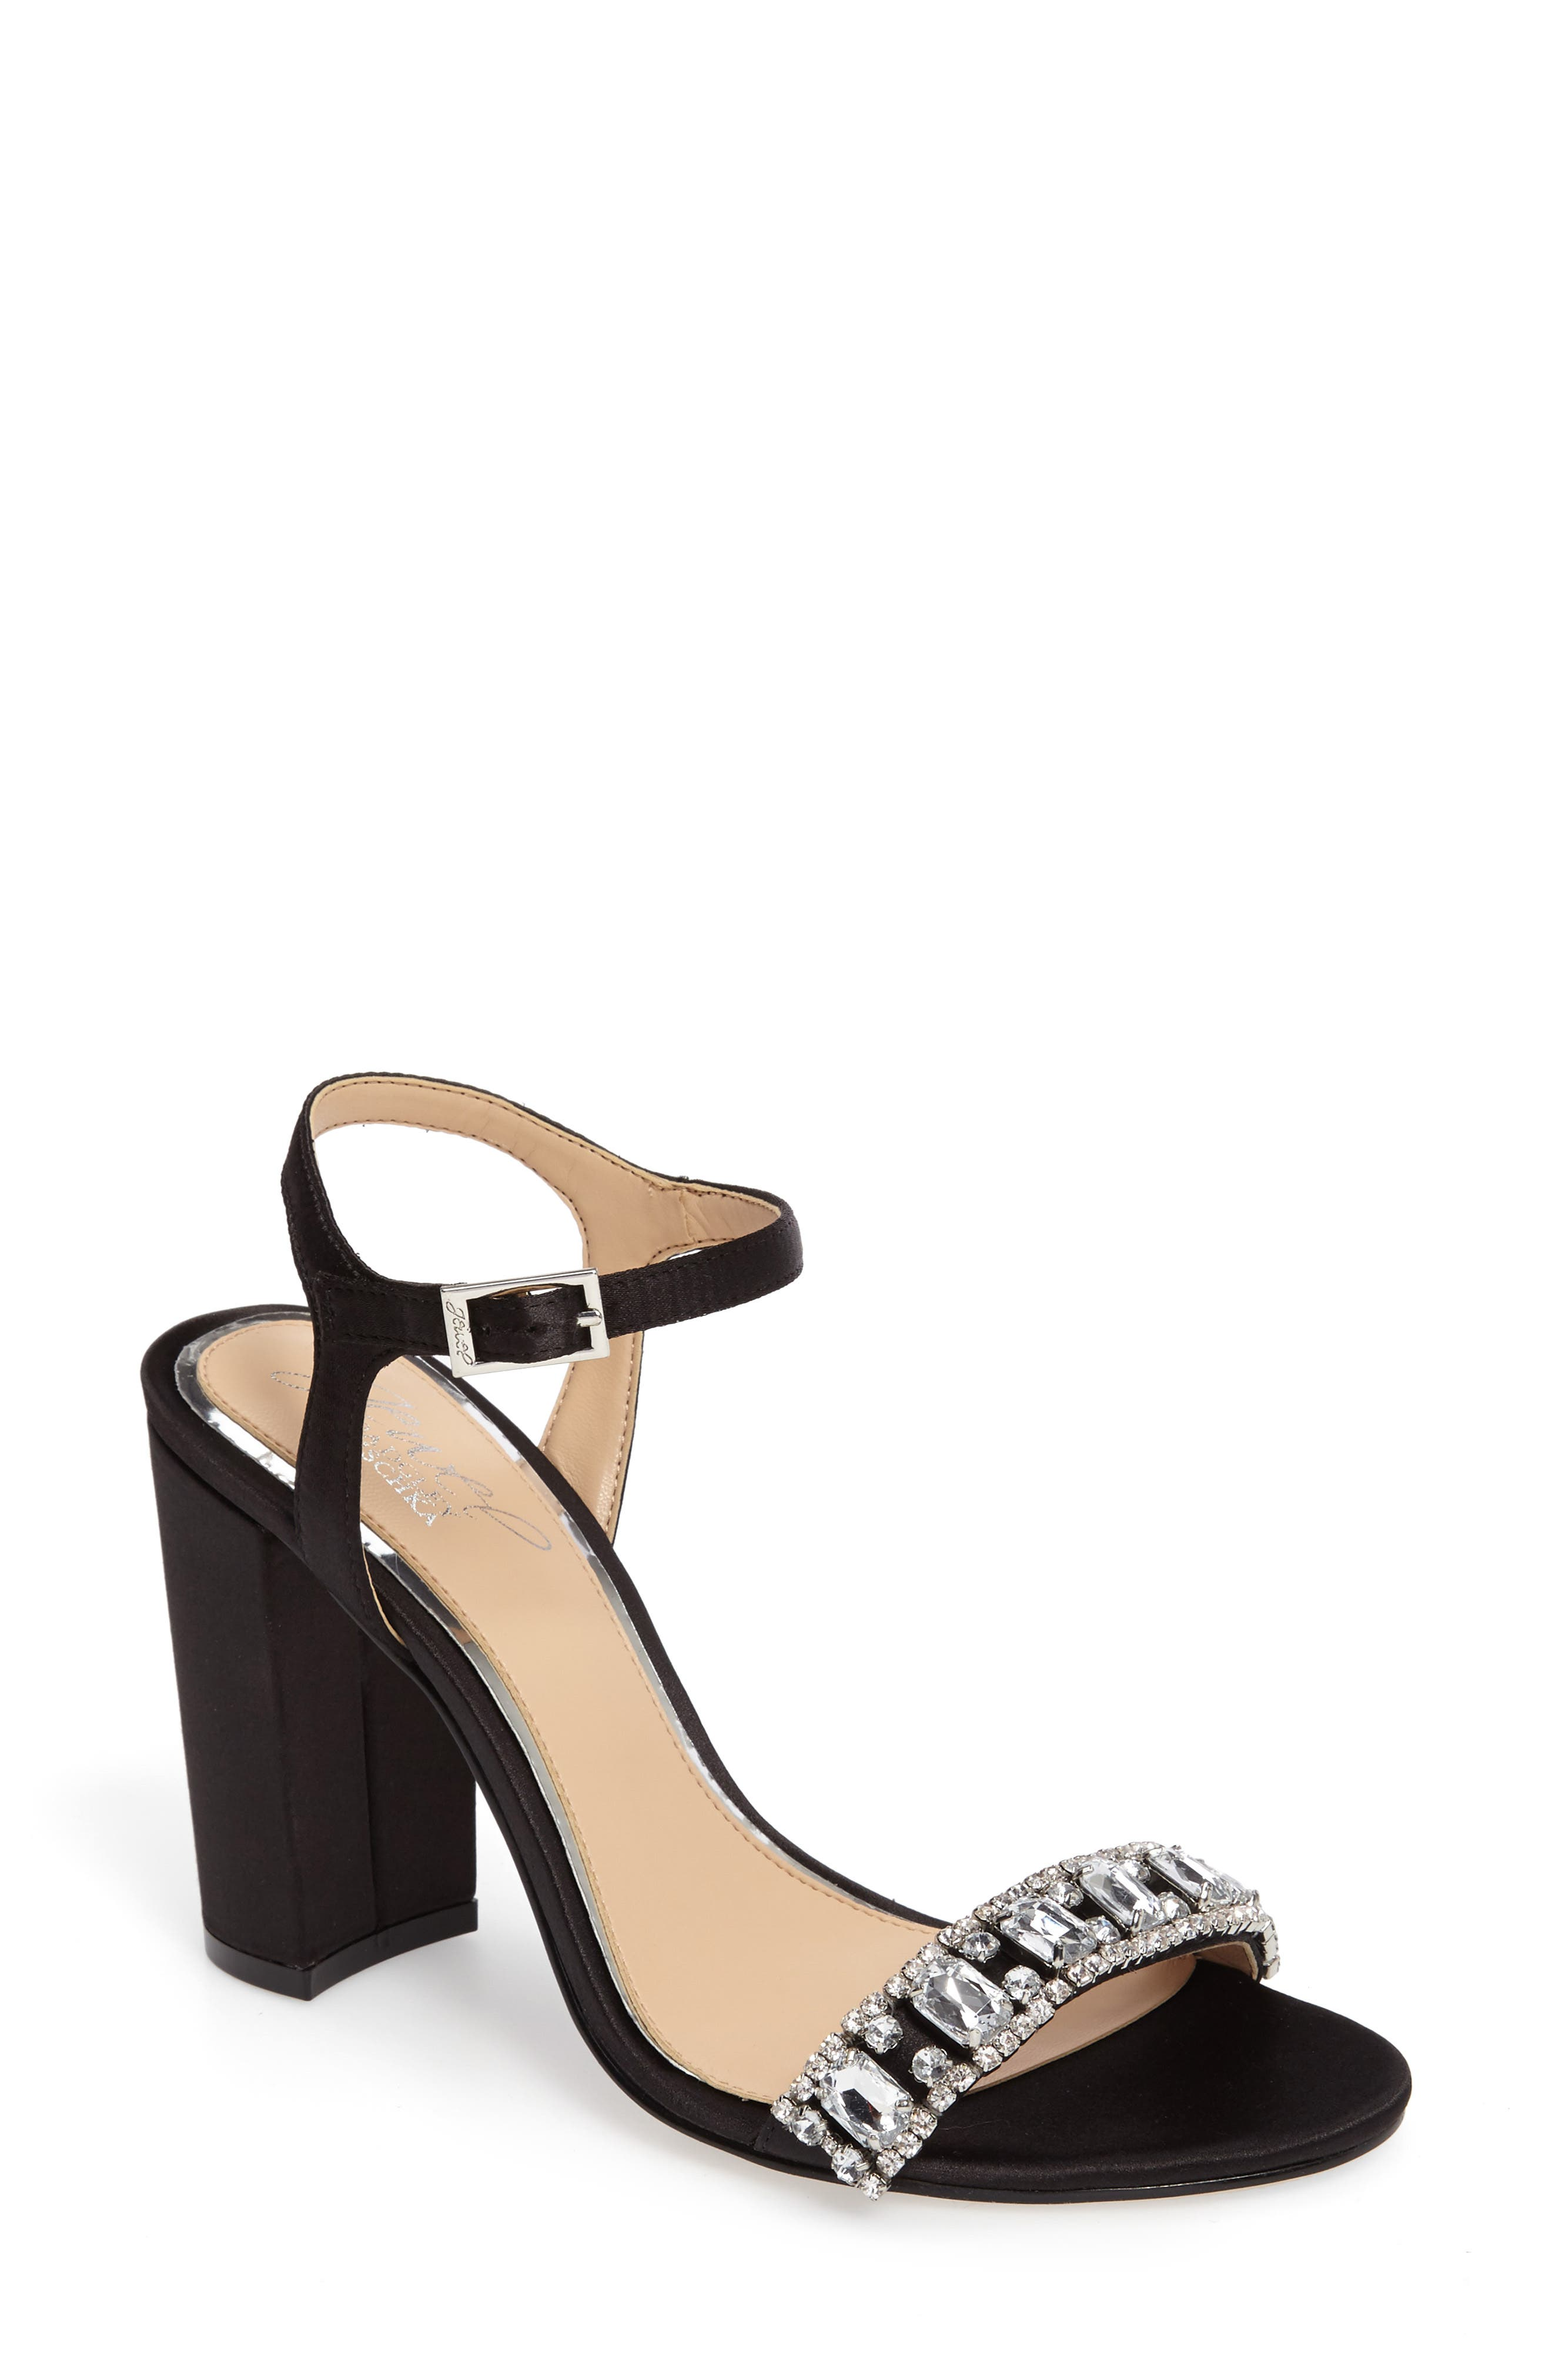 Hendricks Embellished Block Heel Sandal,                             Main thumbnail 3, color,